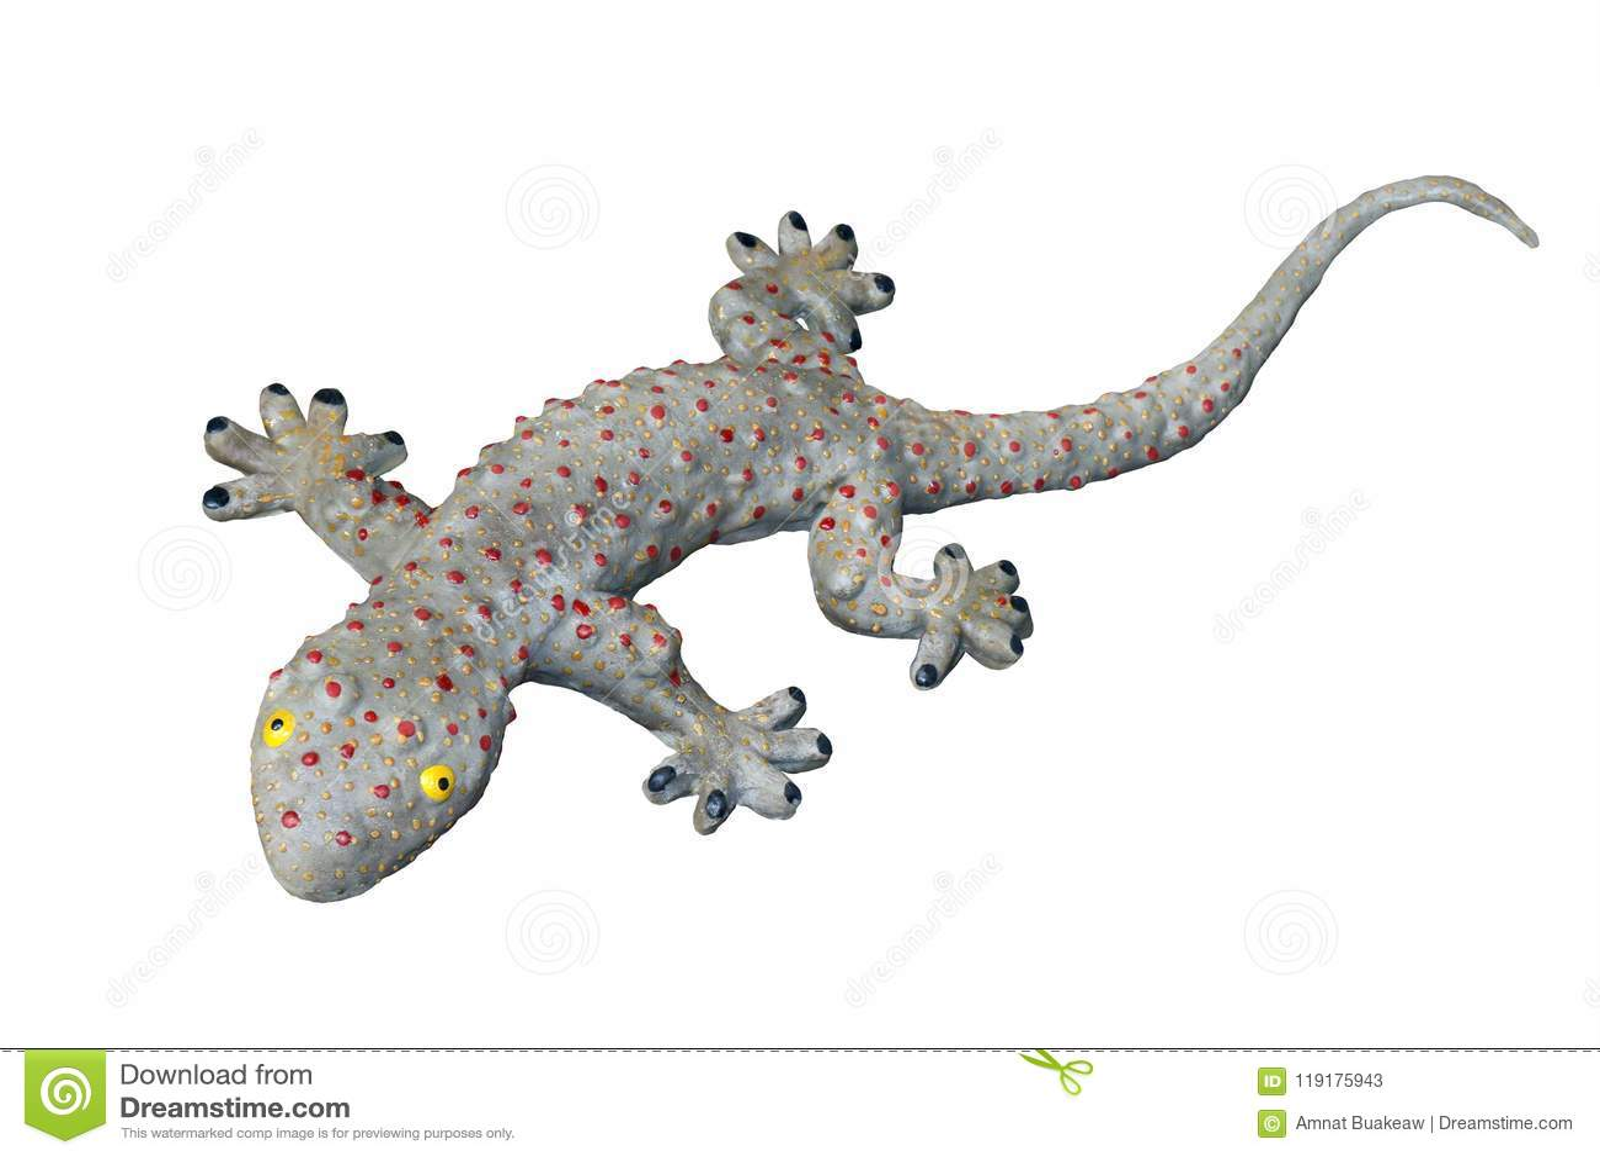 Geckoleksaken, den stora enorma geckoödlan, gecko isolerade vit bakgrund